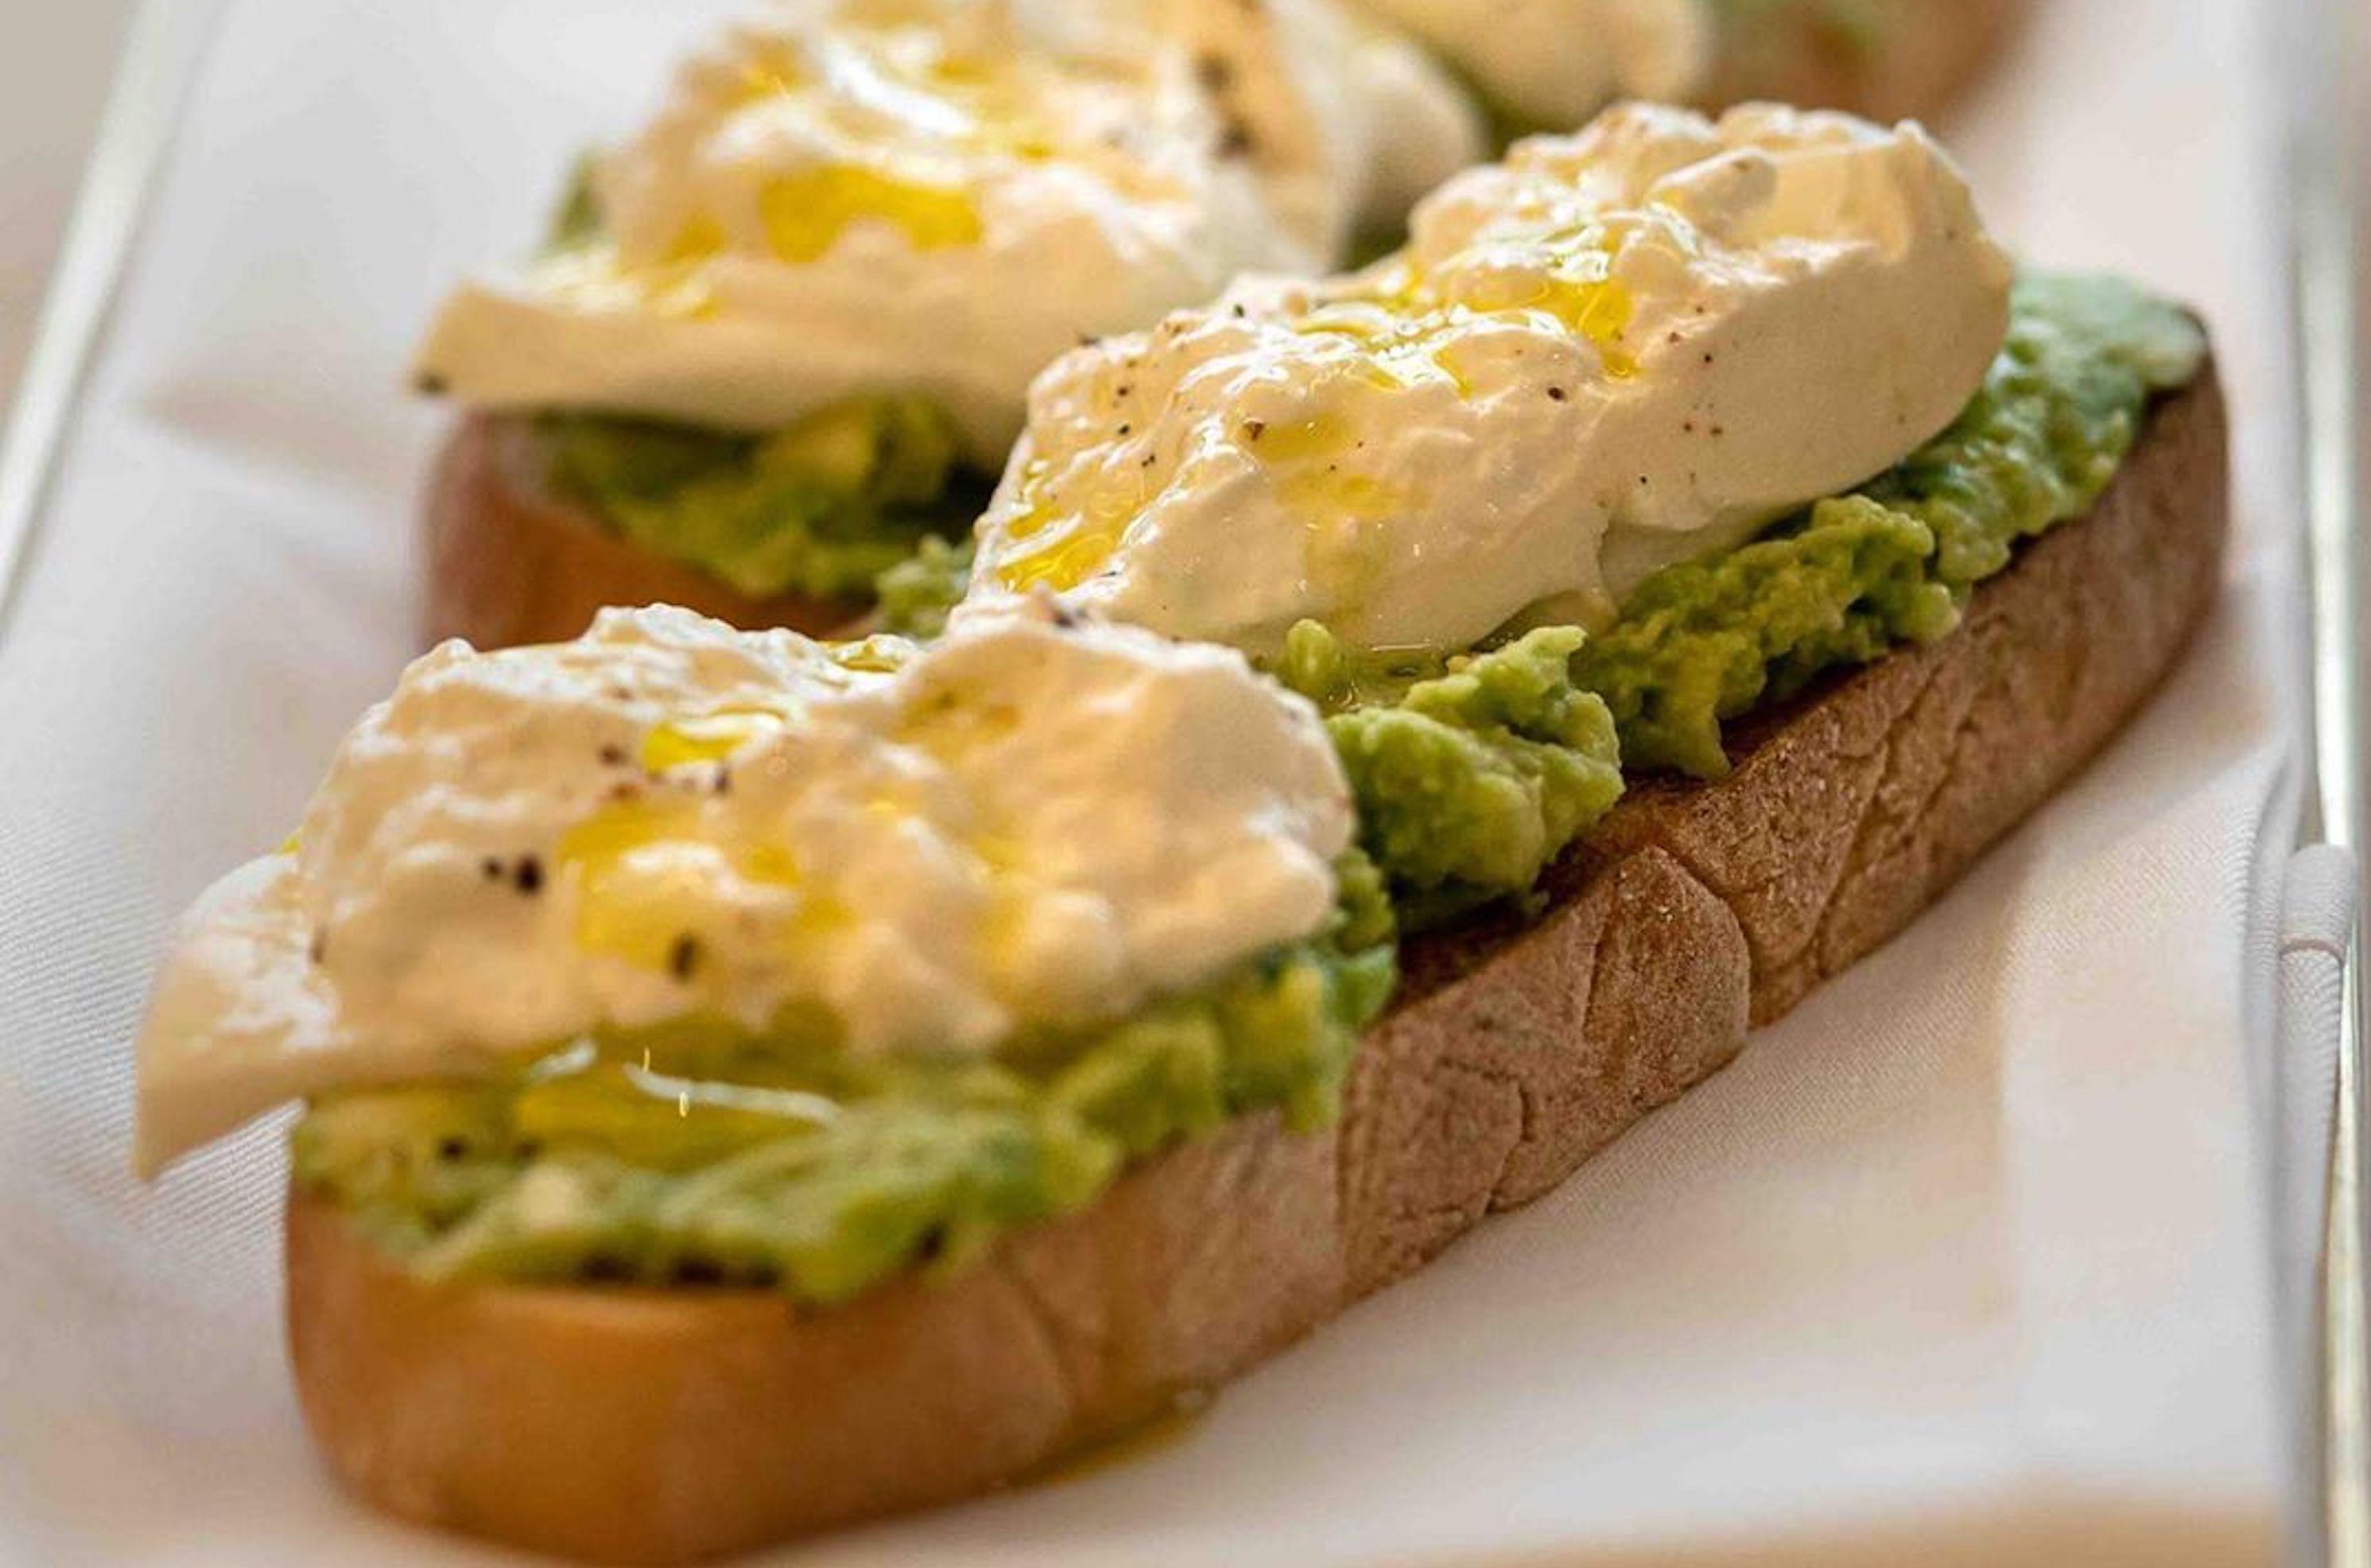 Dessert Maestro Albert Adria Can't Avoid Avocado Toast's Death Grip on Brunch